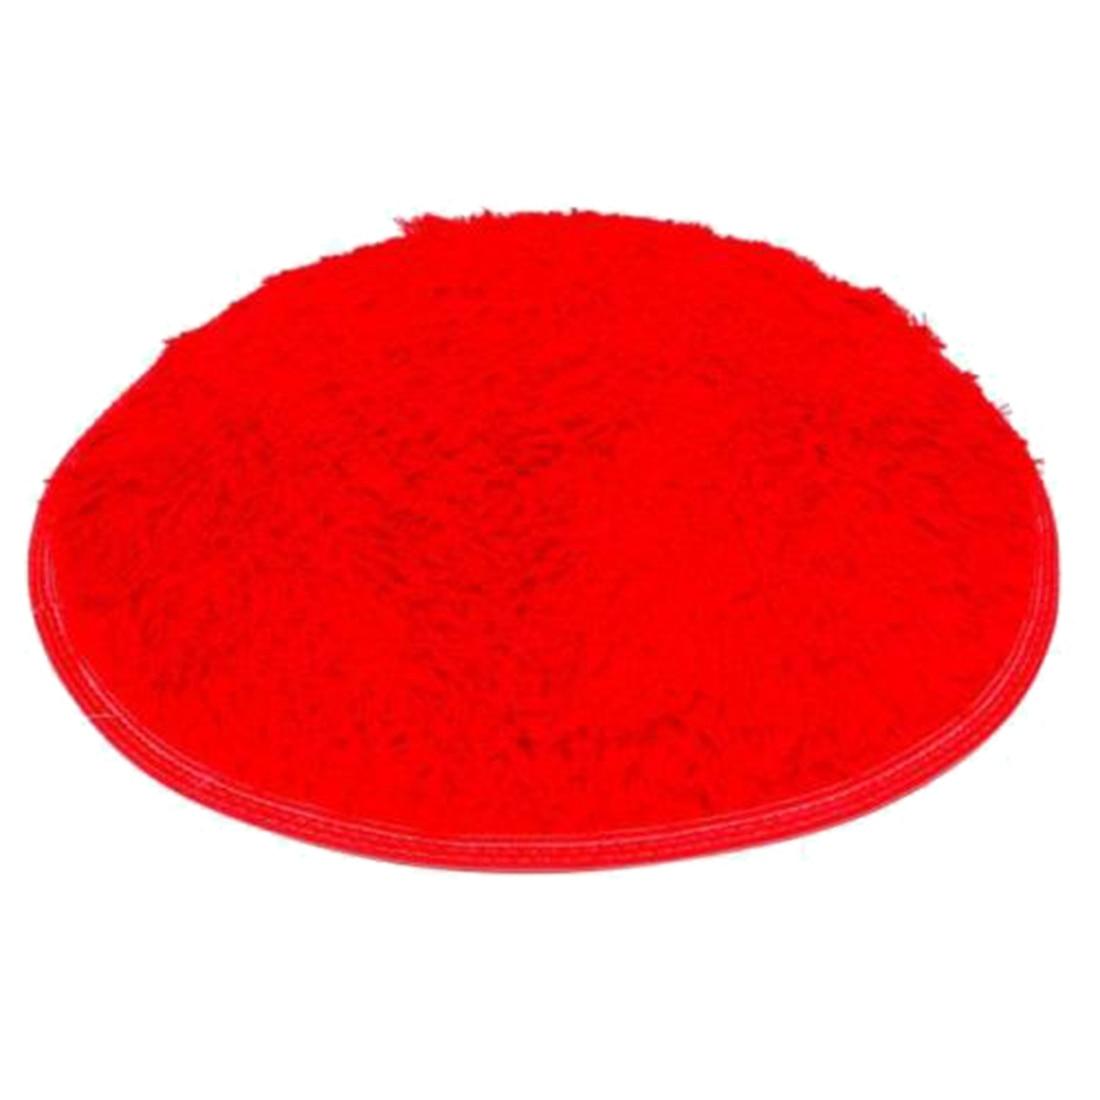 red bathroom rug, Home decor